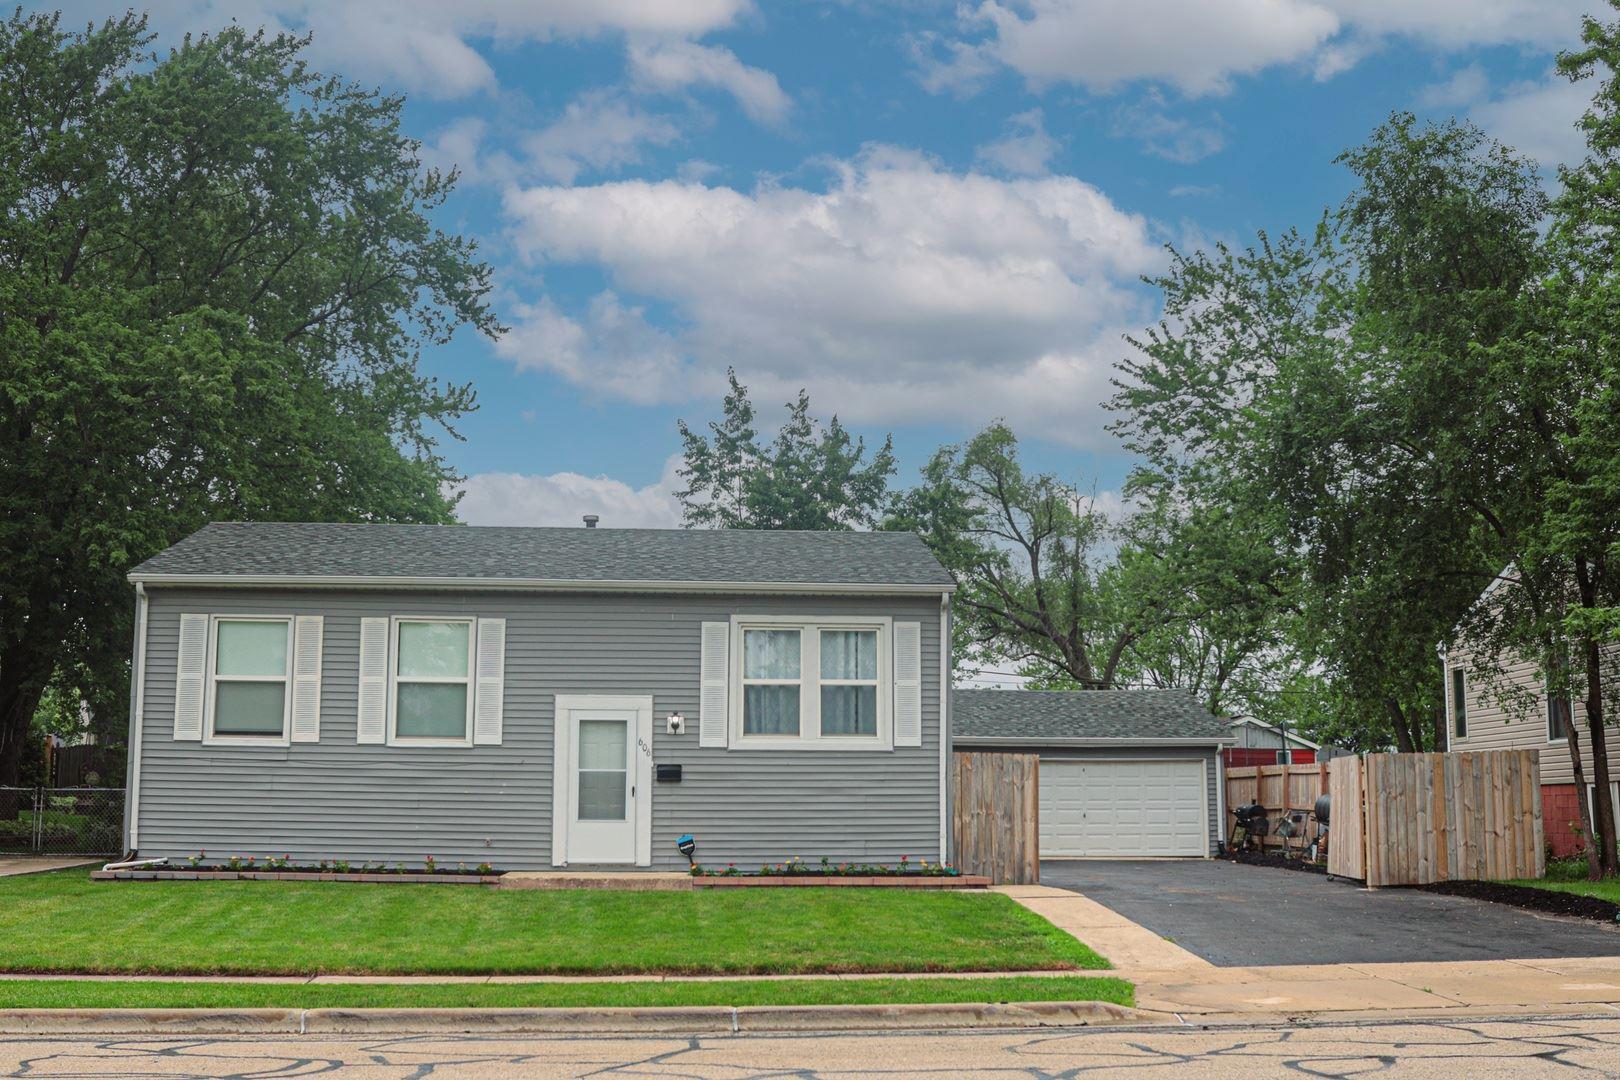 Photo of 606 Murphy Drive, Romeoville, IL 60446 (MLS # 11153623)